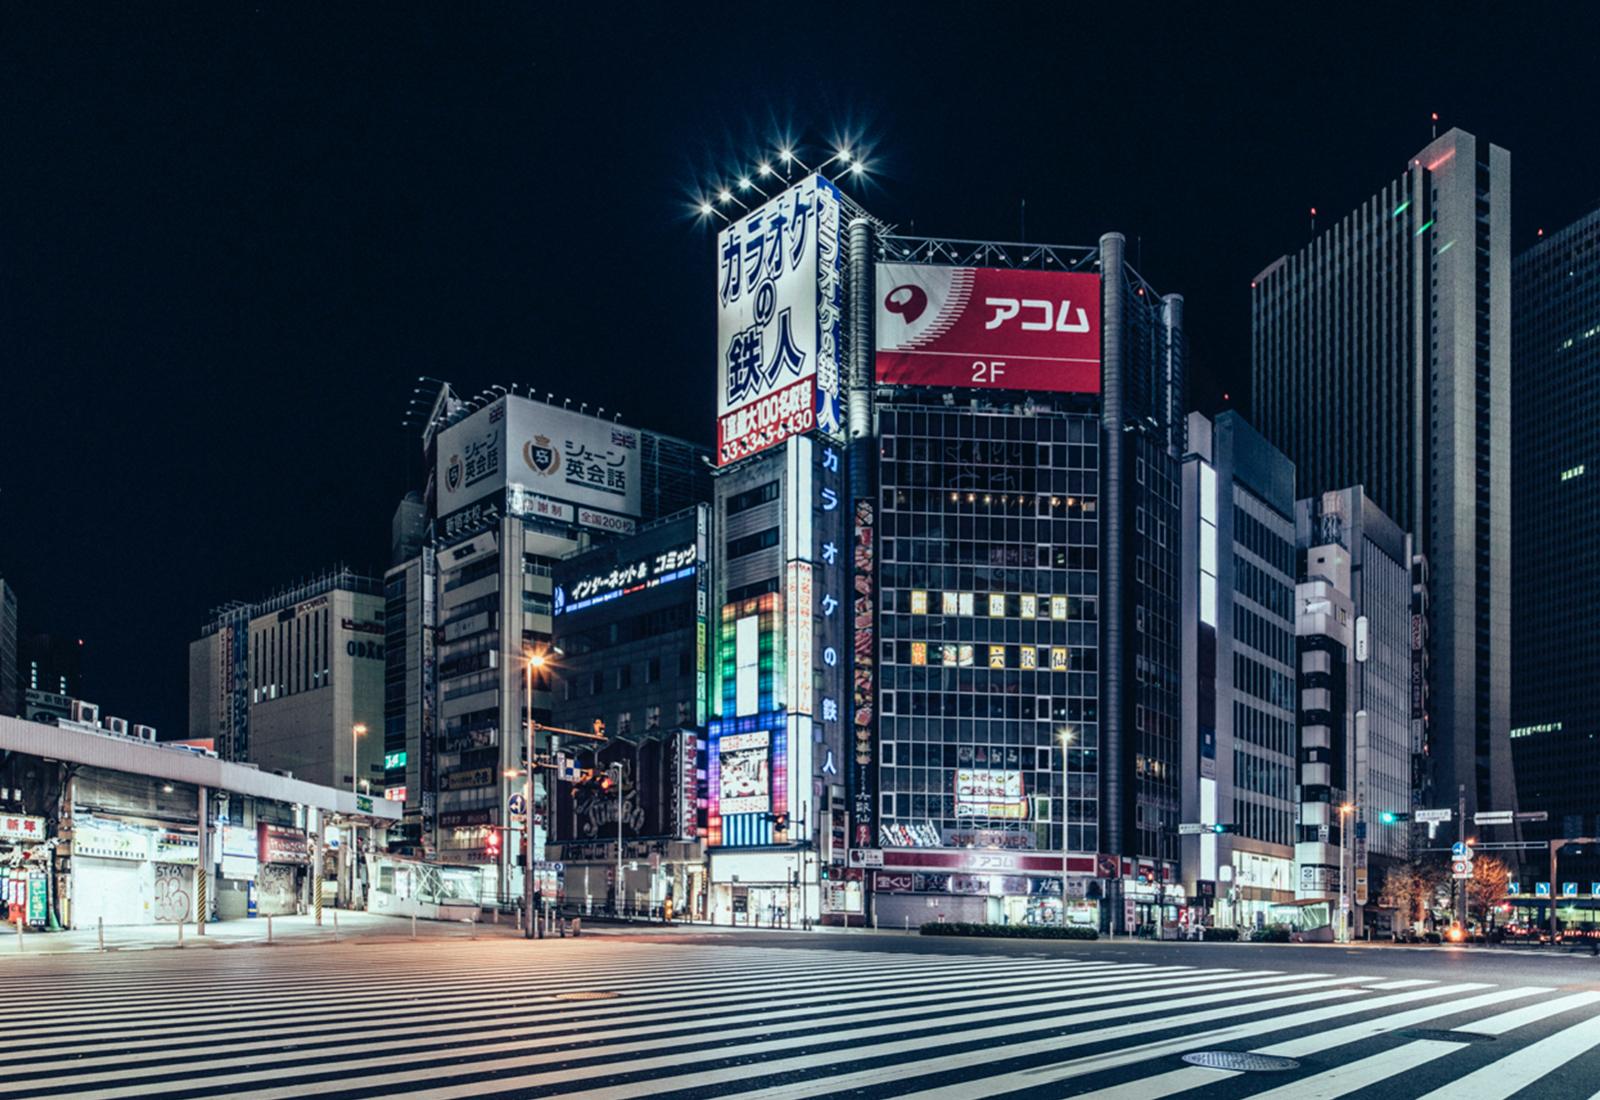 "genaro bardy ville deserte nuit japon tokyo photo art - ""Desert in the city"" : Genaro Bardy photographie Tokyo vidée de ses habitants"